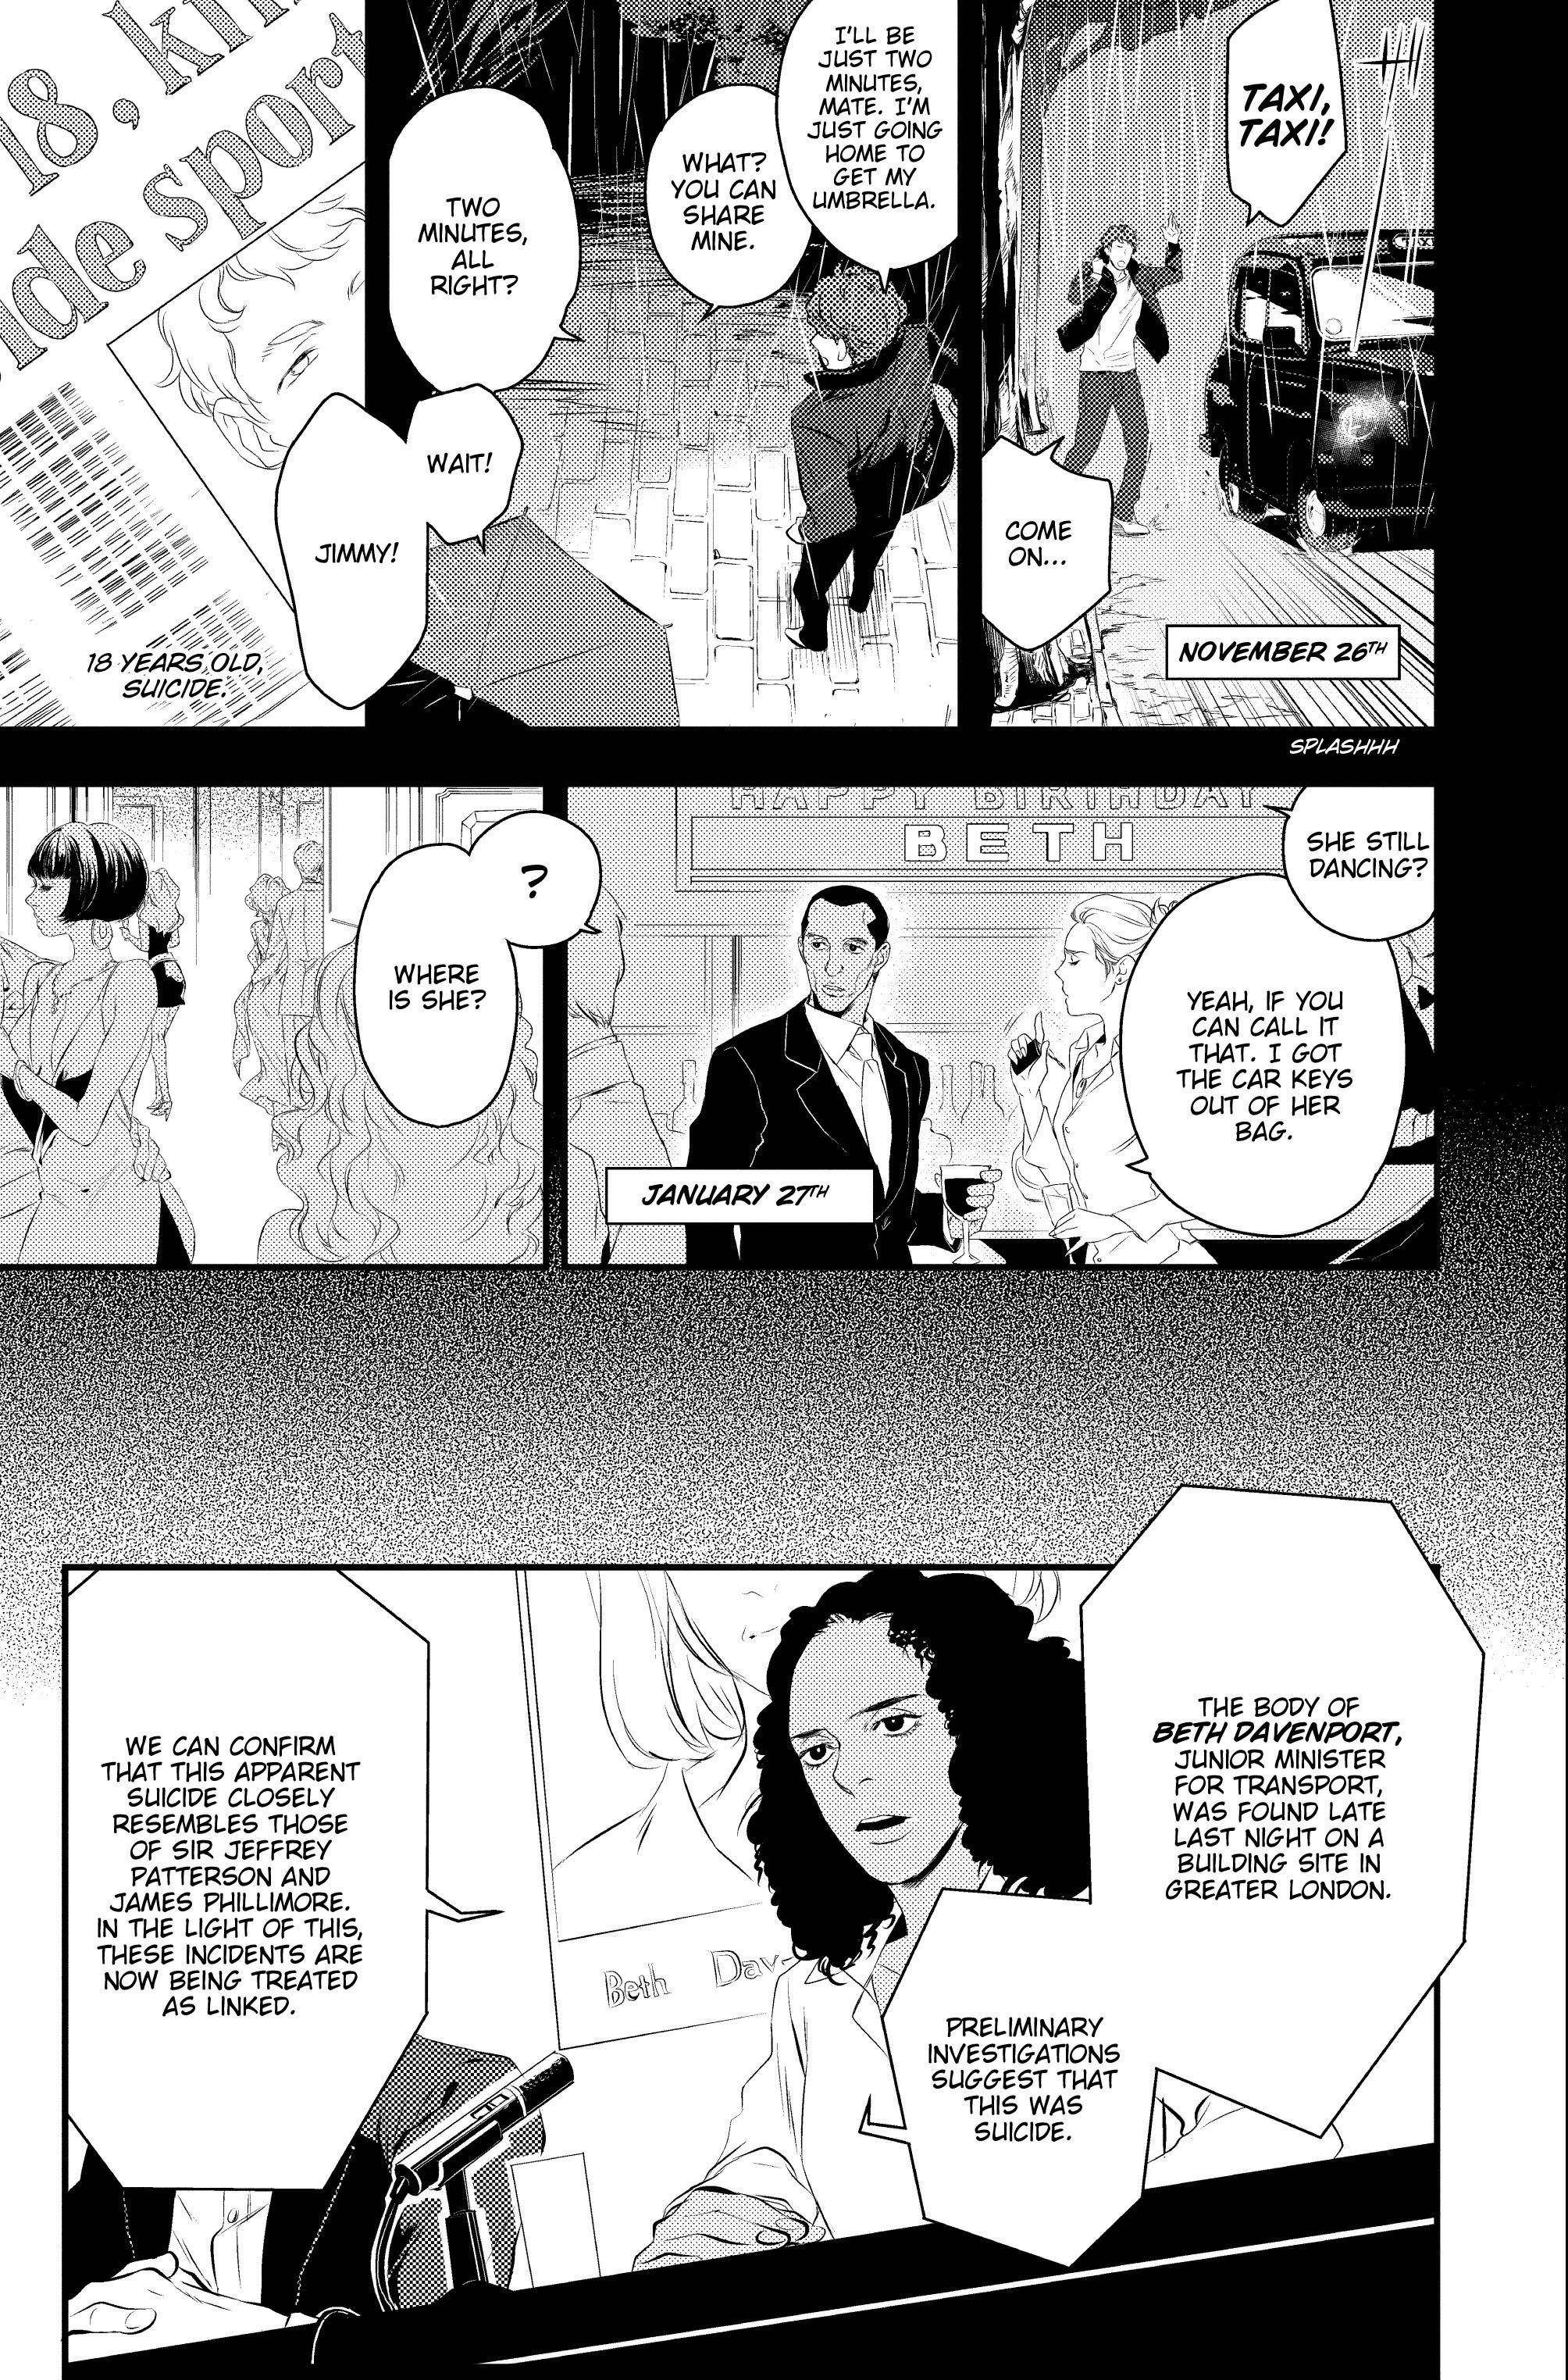 Read online Sherlock: A Study In Pink comic -  Issue #1 - 11